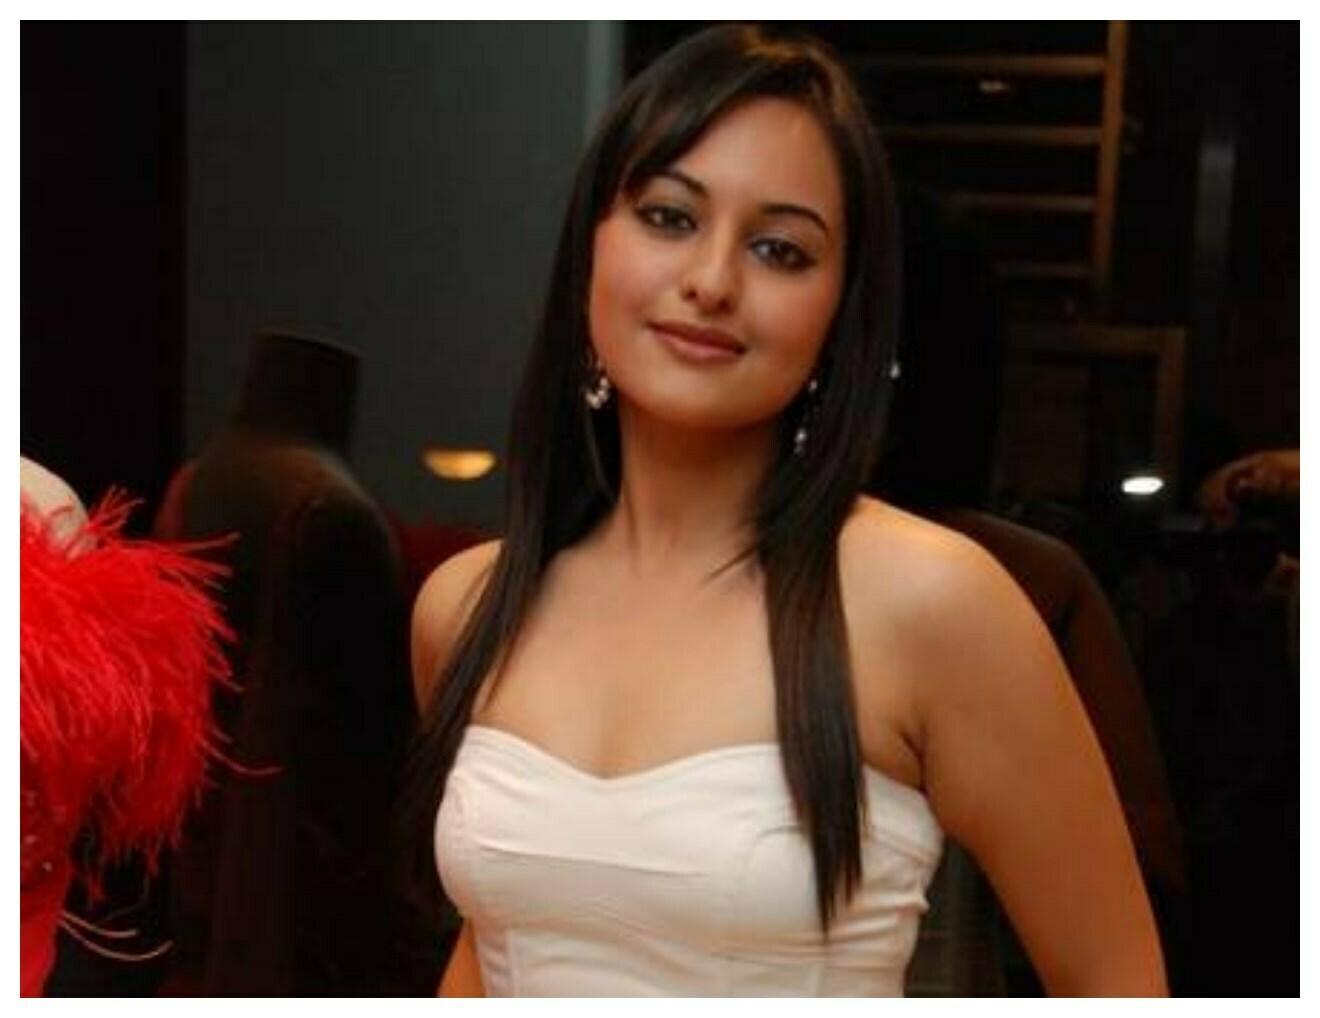 Wallpapers Hd Joker Sonakshi Sinha Bollywood Star Hd Wallpaper Pics Hd Walls